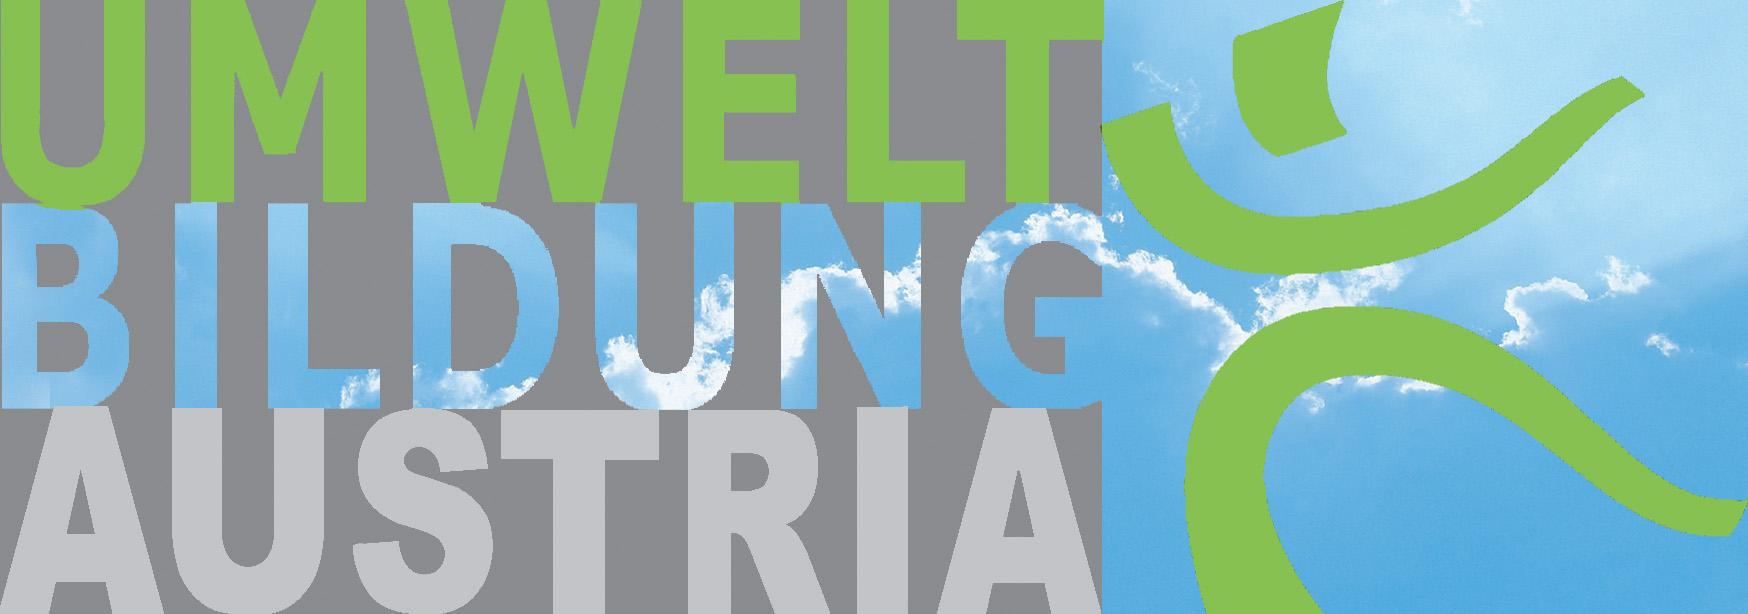 Logo UmweltBildungAustria – Grüne Insel